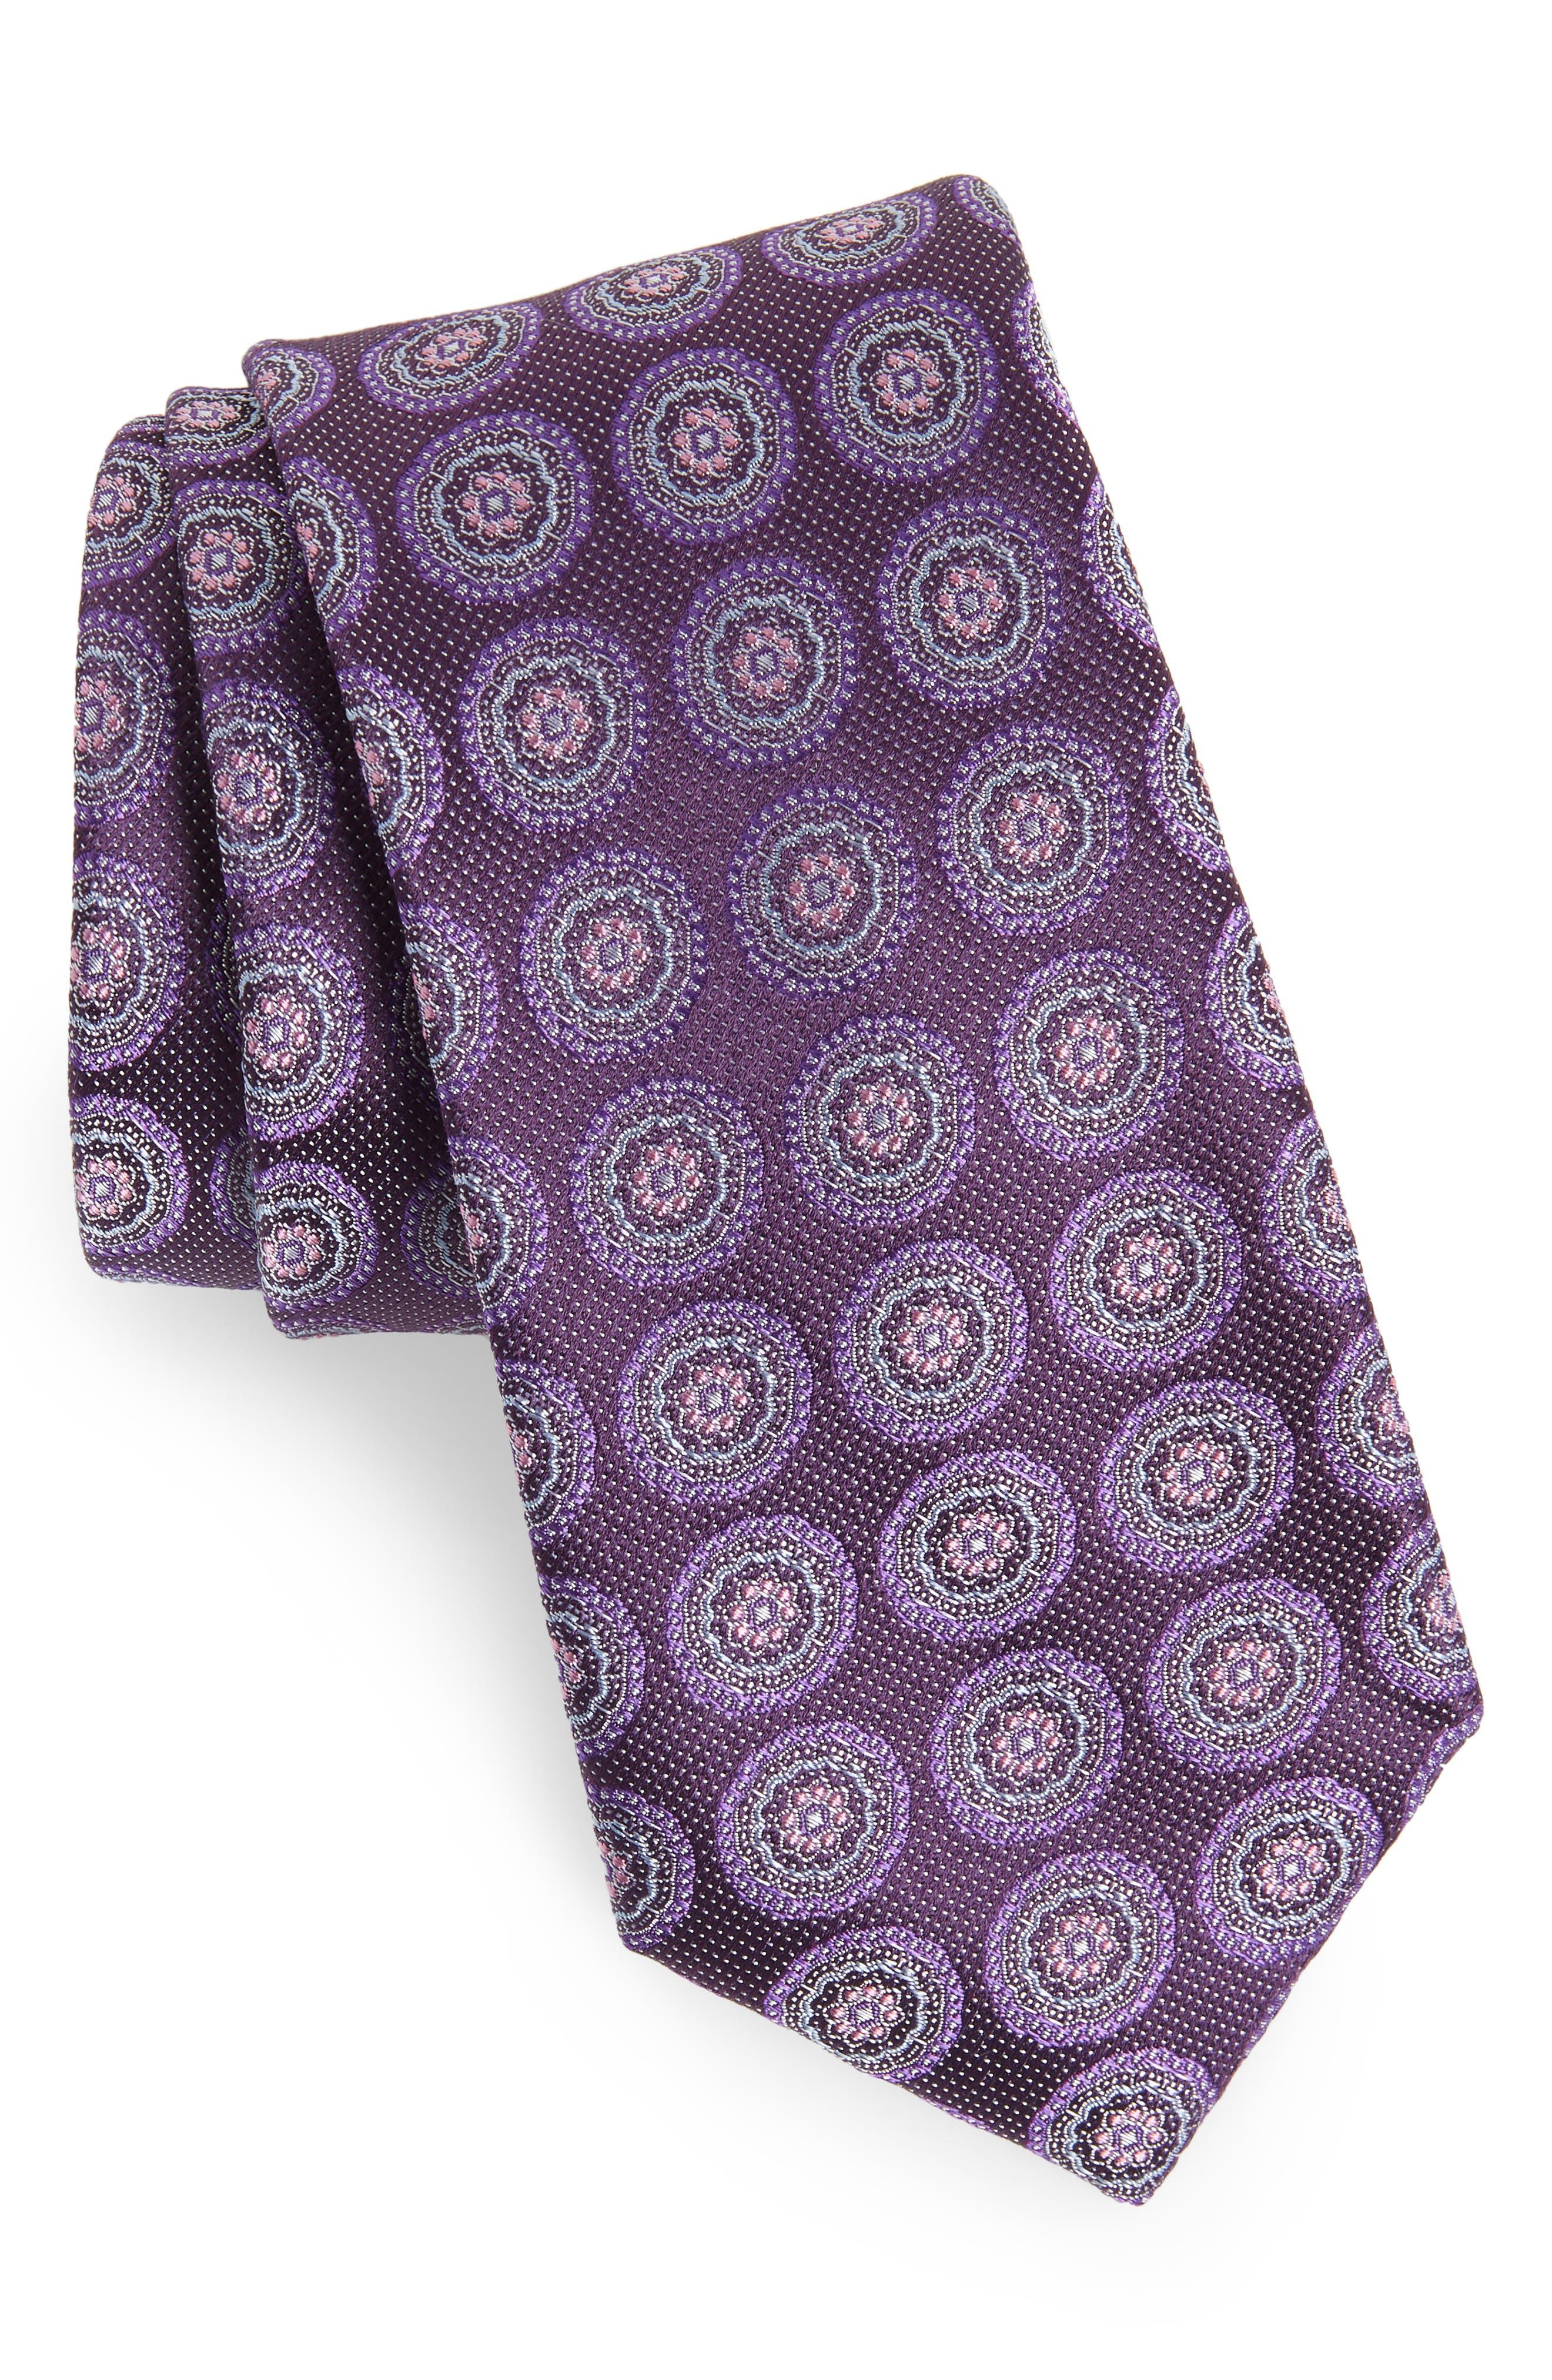 Pinpoint Medallion Silk Tie,                         Main,                         color, DARK FASHION PURPLE